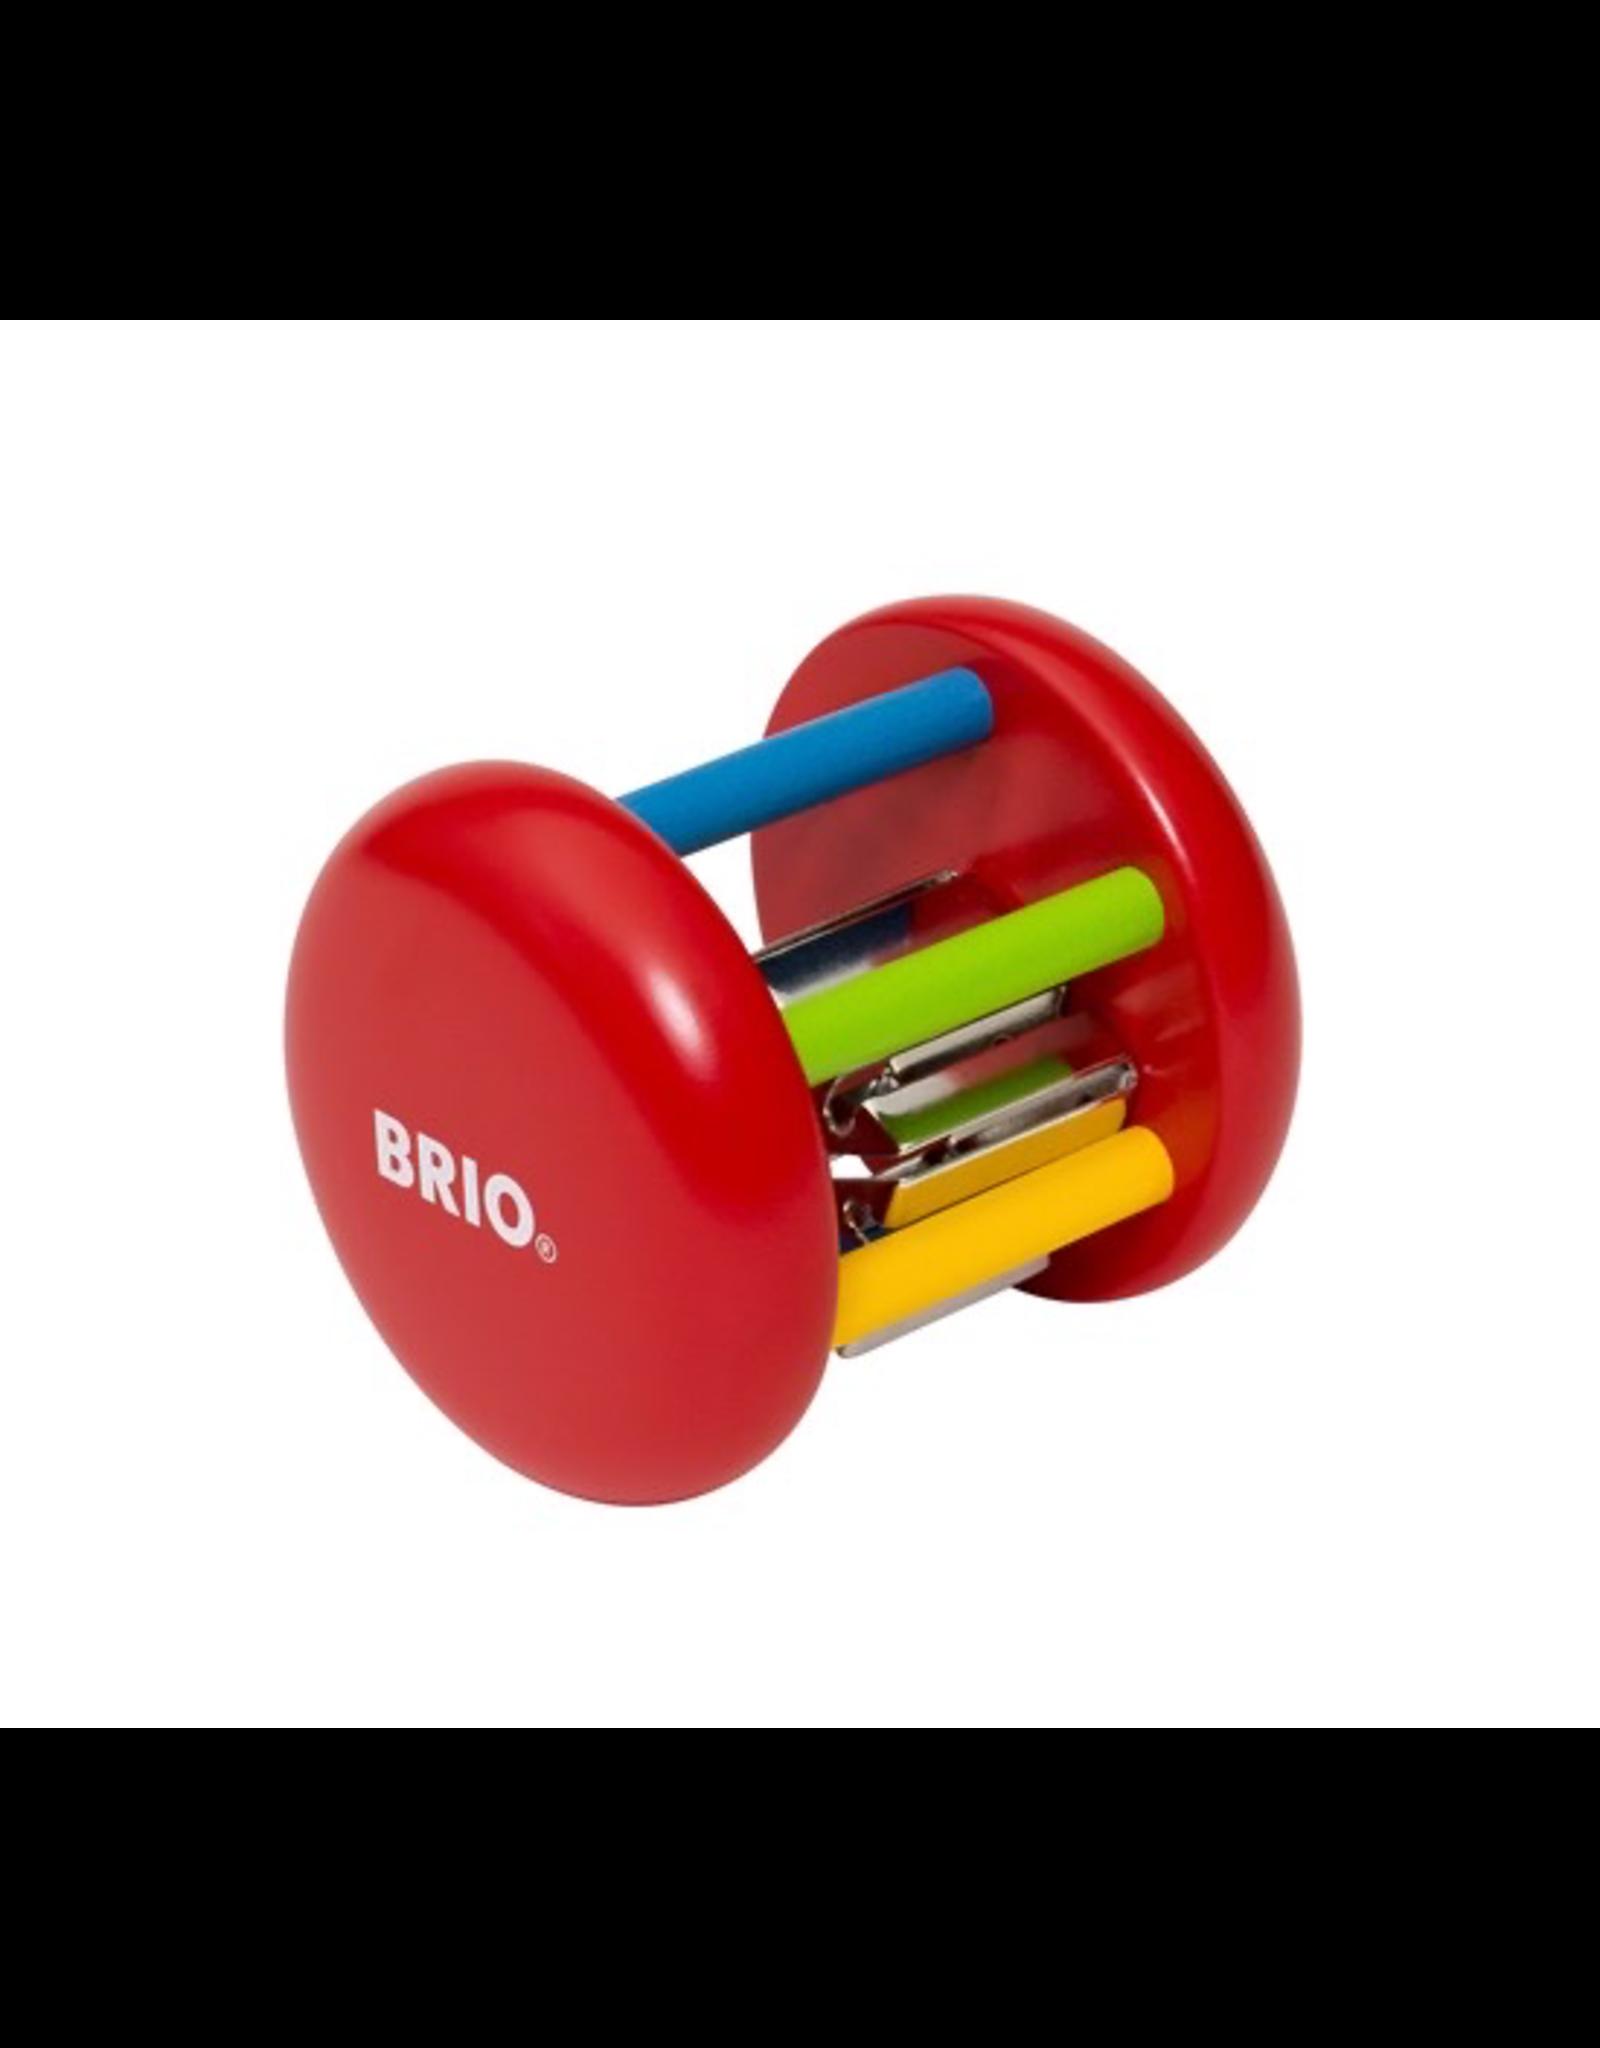 BRIO BELL RATTLE BY BRIO